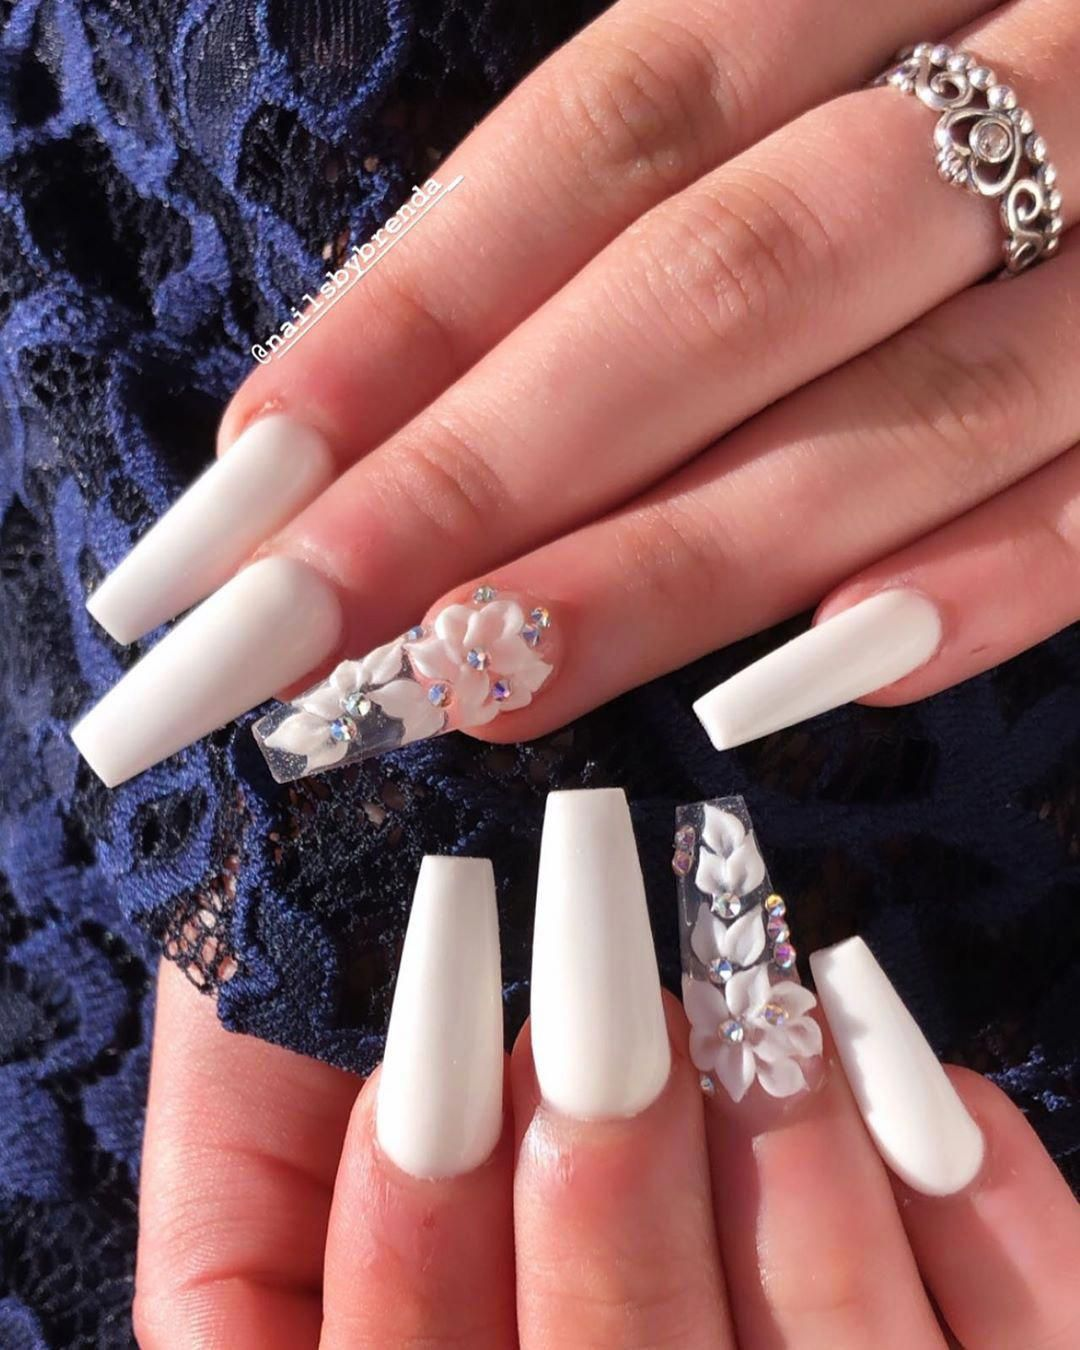 Dangerous False Nails In 2020 White Coffin Nails Fake Nails White Acrylic Nails